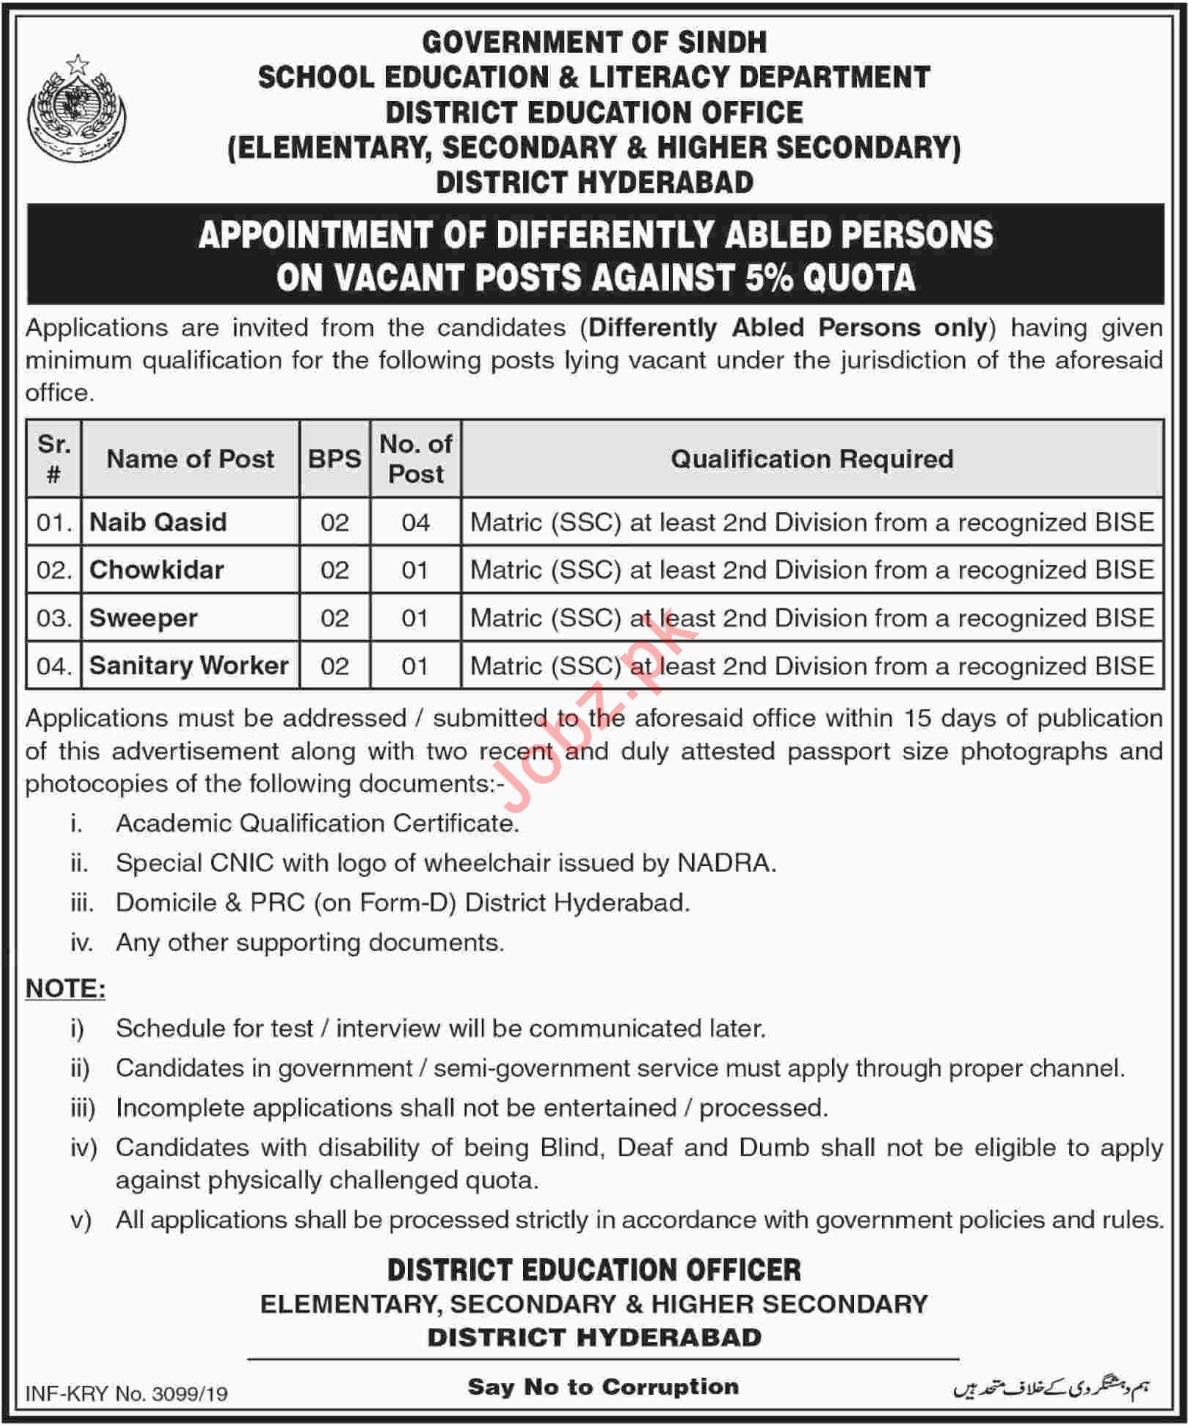 School Education & Literacy Department Jobs For Hyderabad